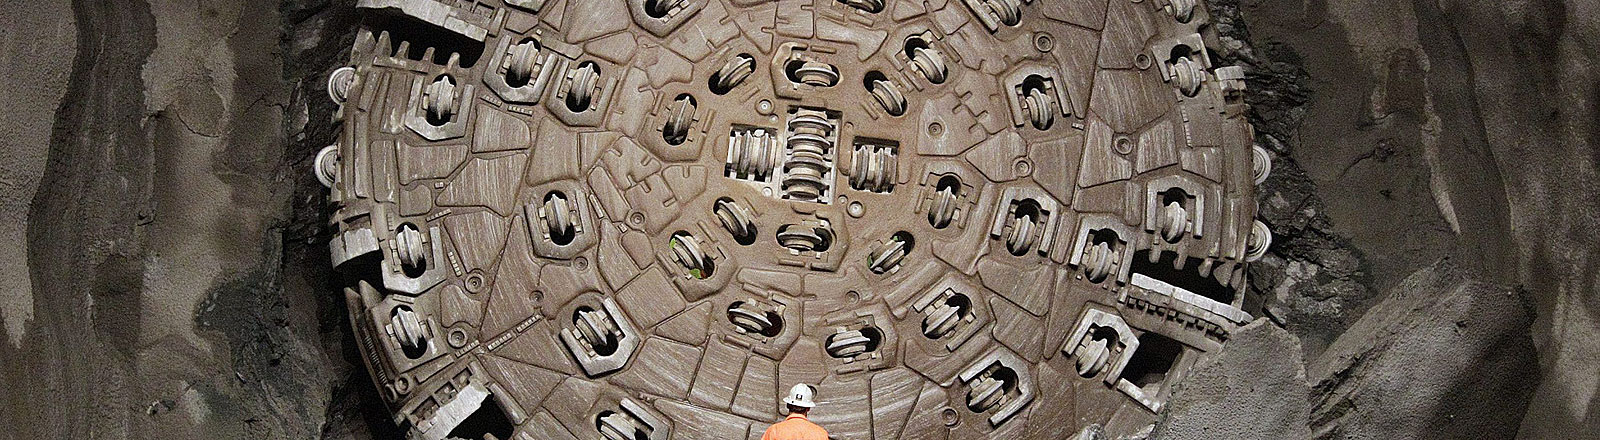 Arbeiten am neuen Gotthard Basis Tunnel